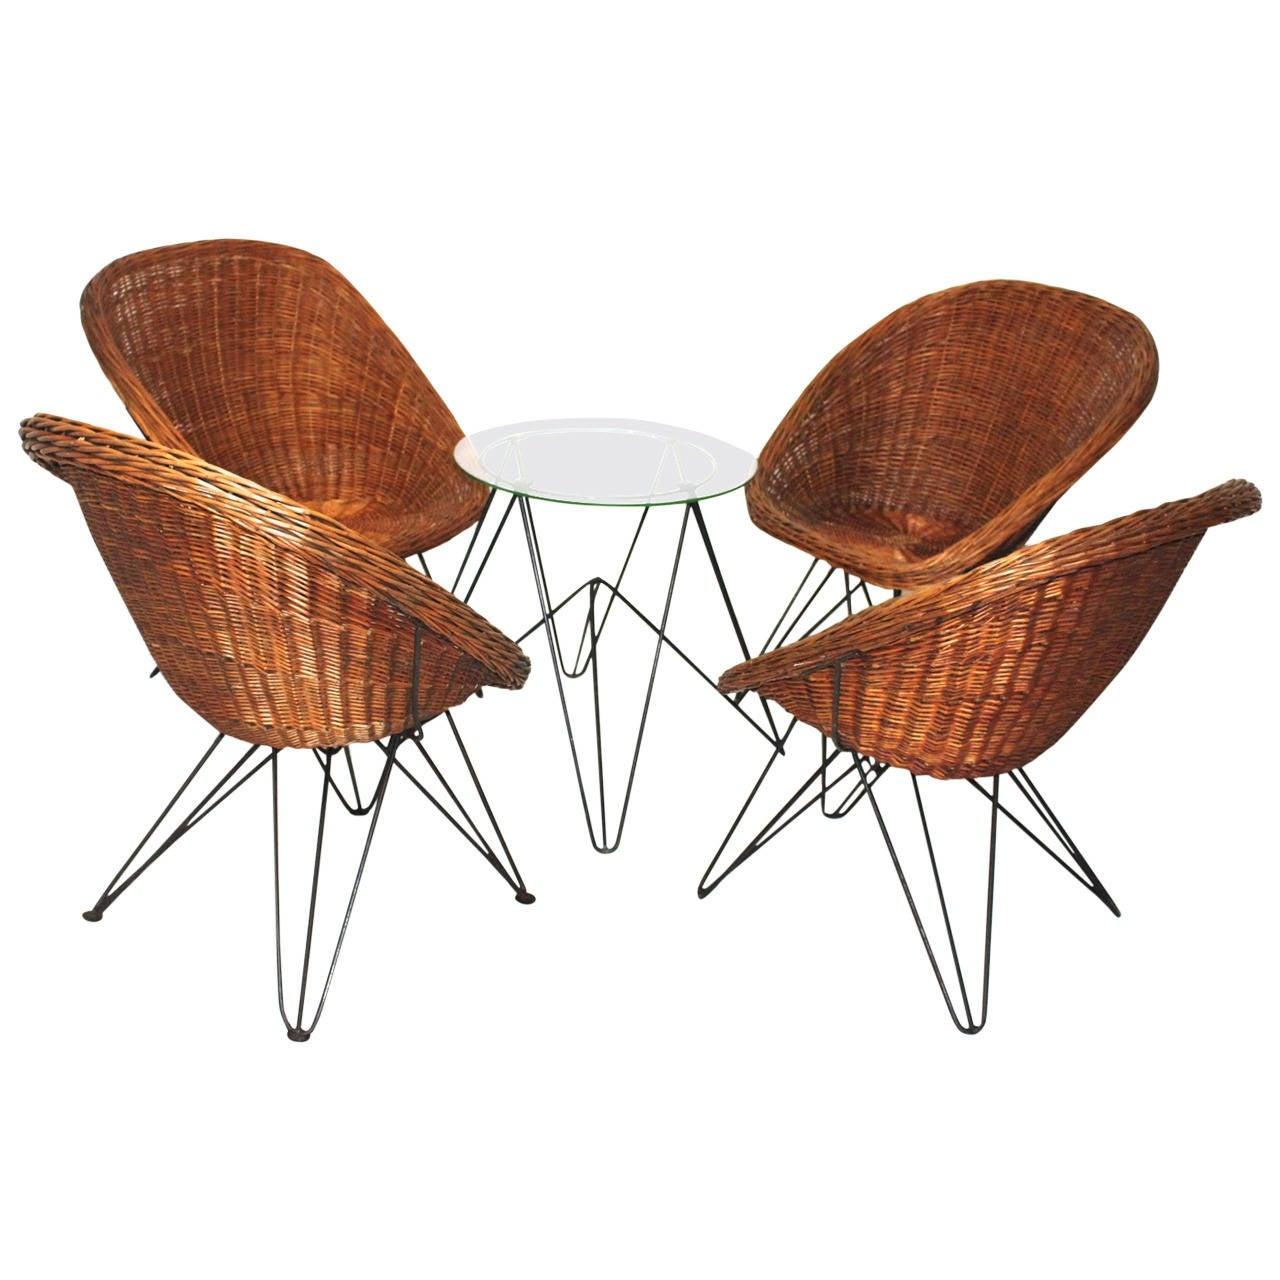 Mid Century Wicker Seating Set By Rohe Noordwolde